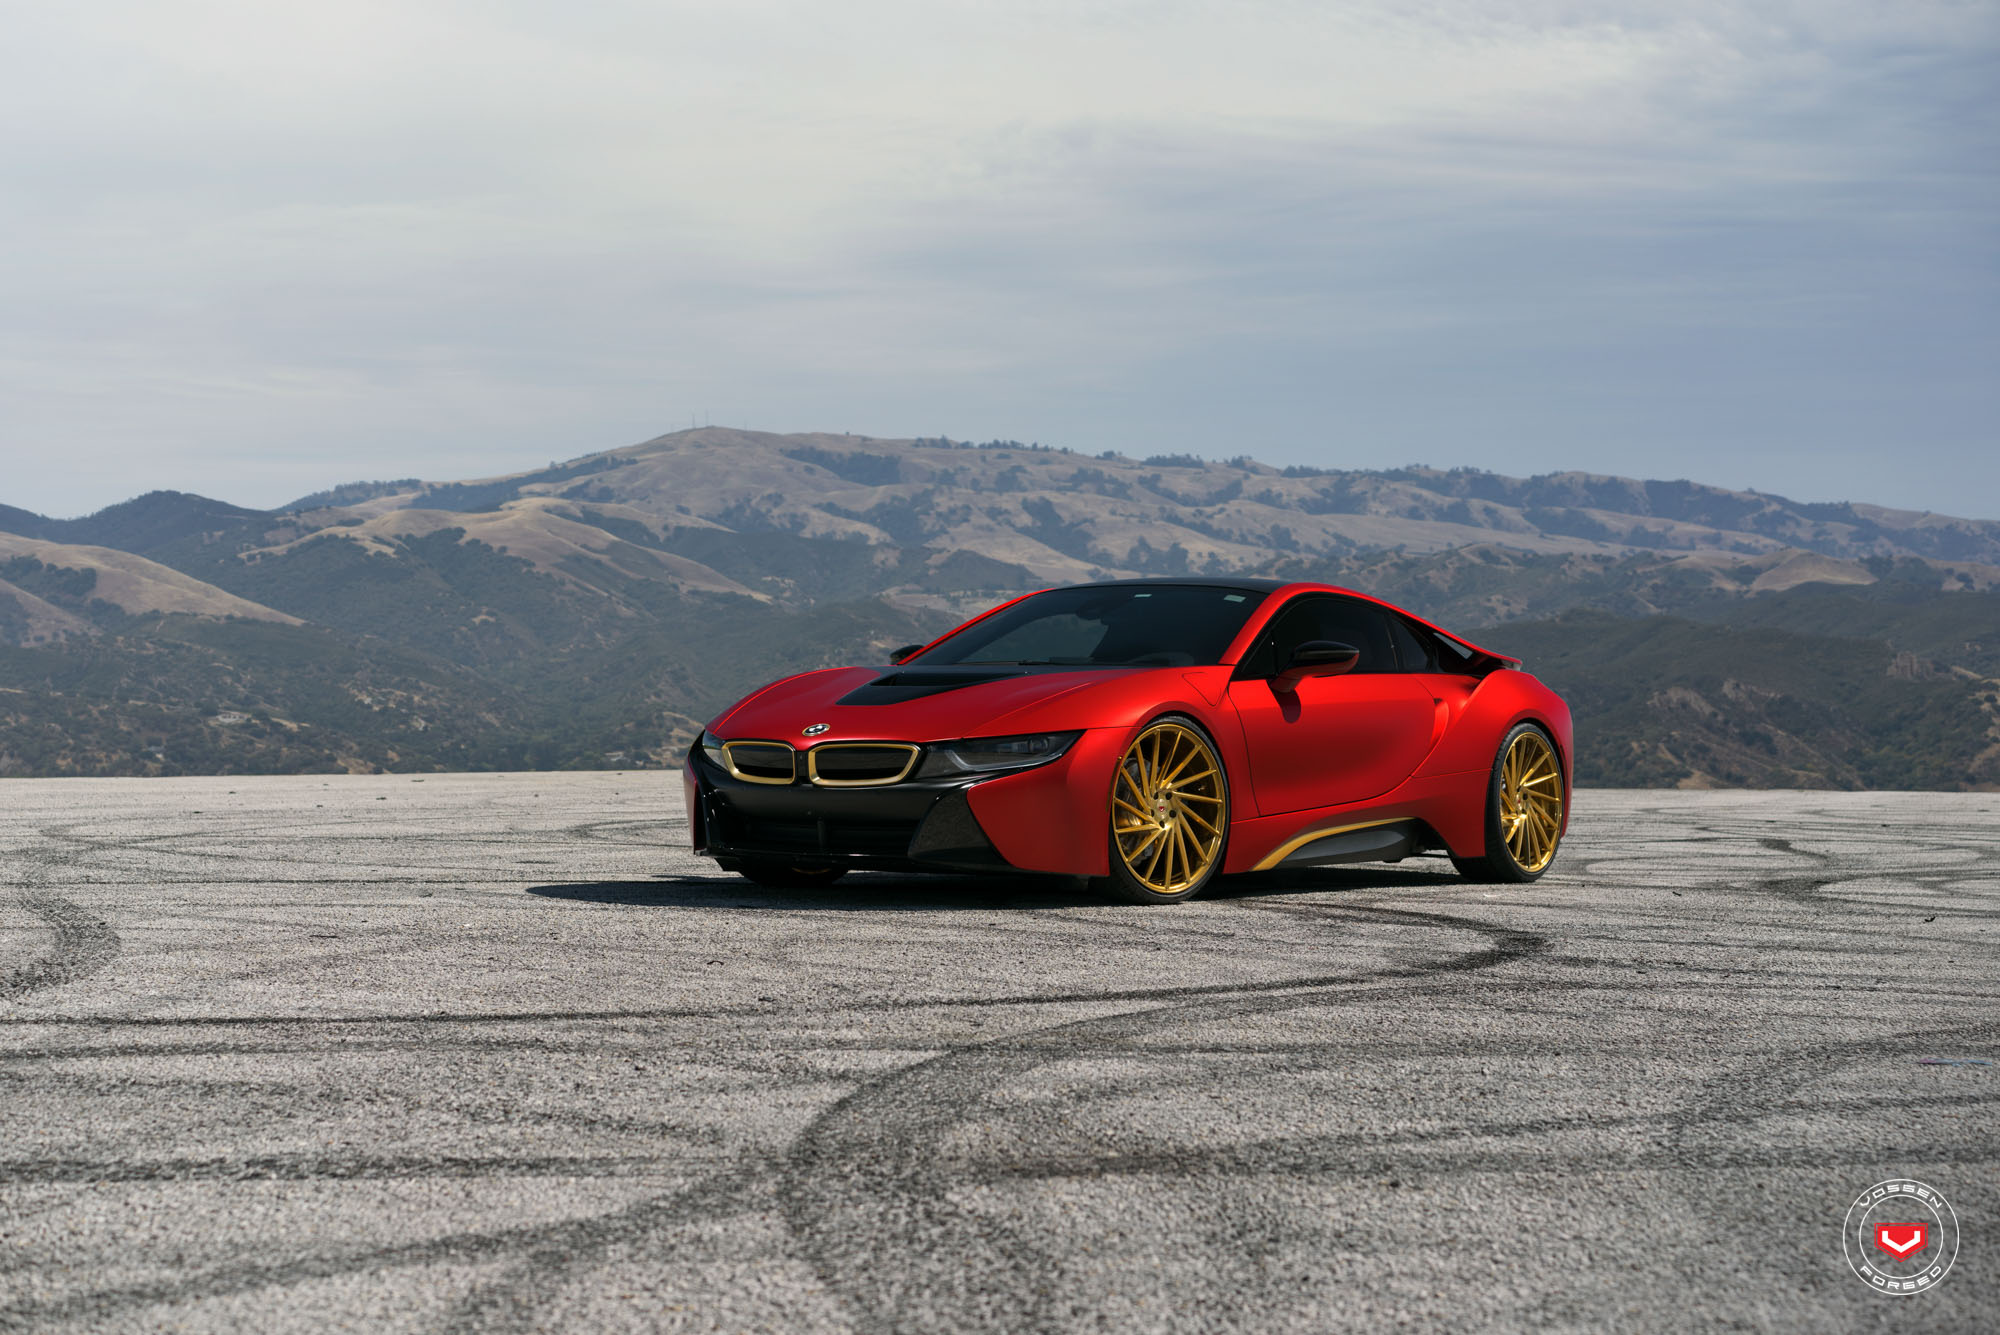 Austin Mahone S Iron Man Bmw I8 Makes More Sense Than The Audi R8 Autoevolution